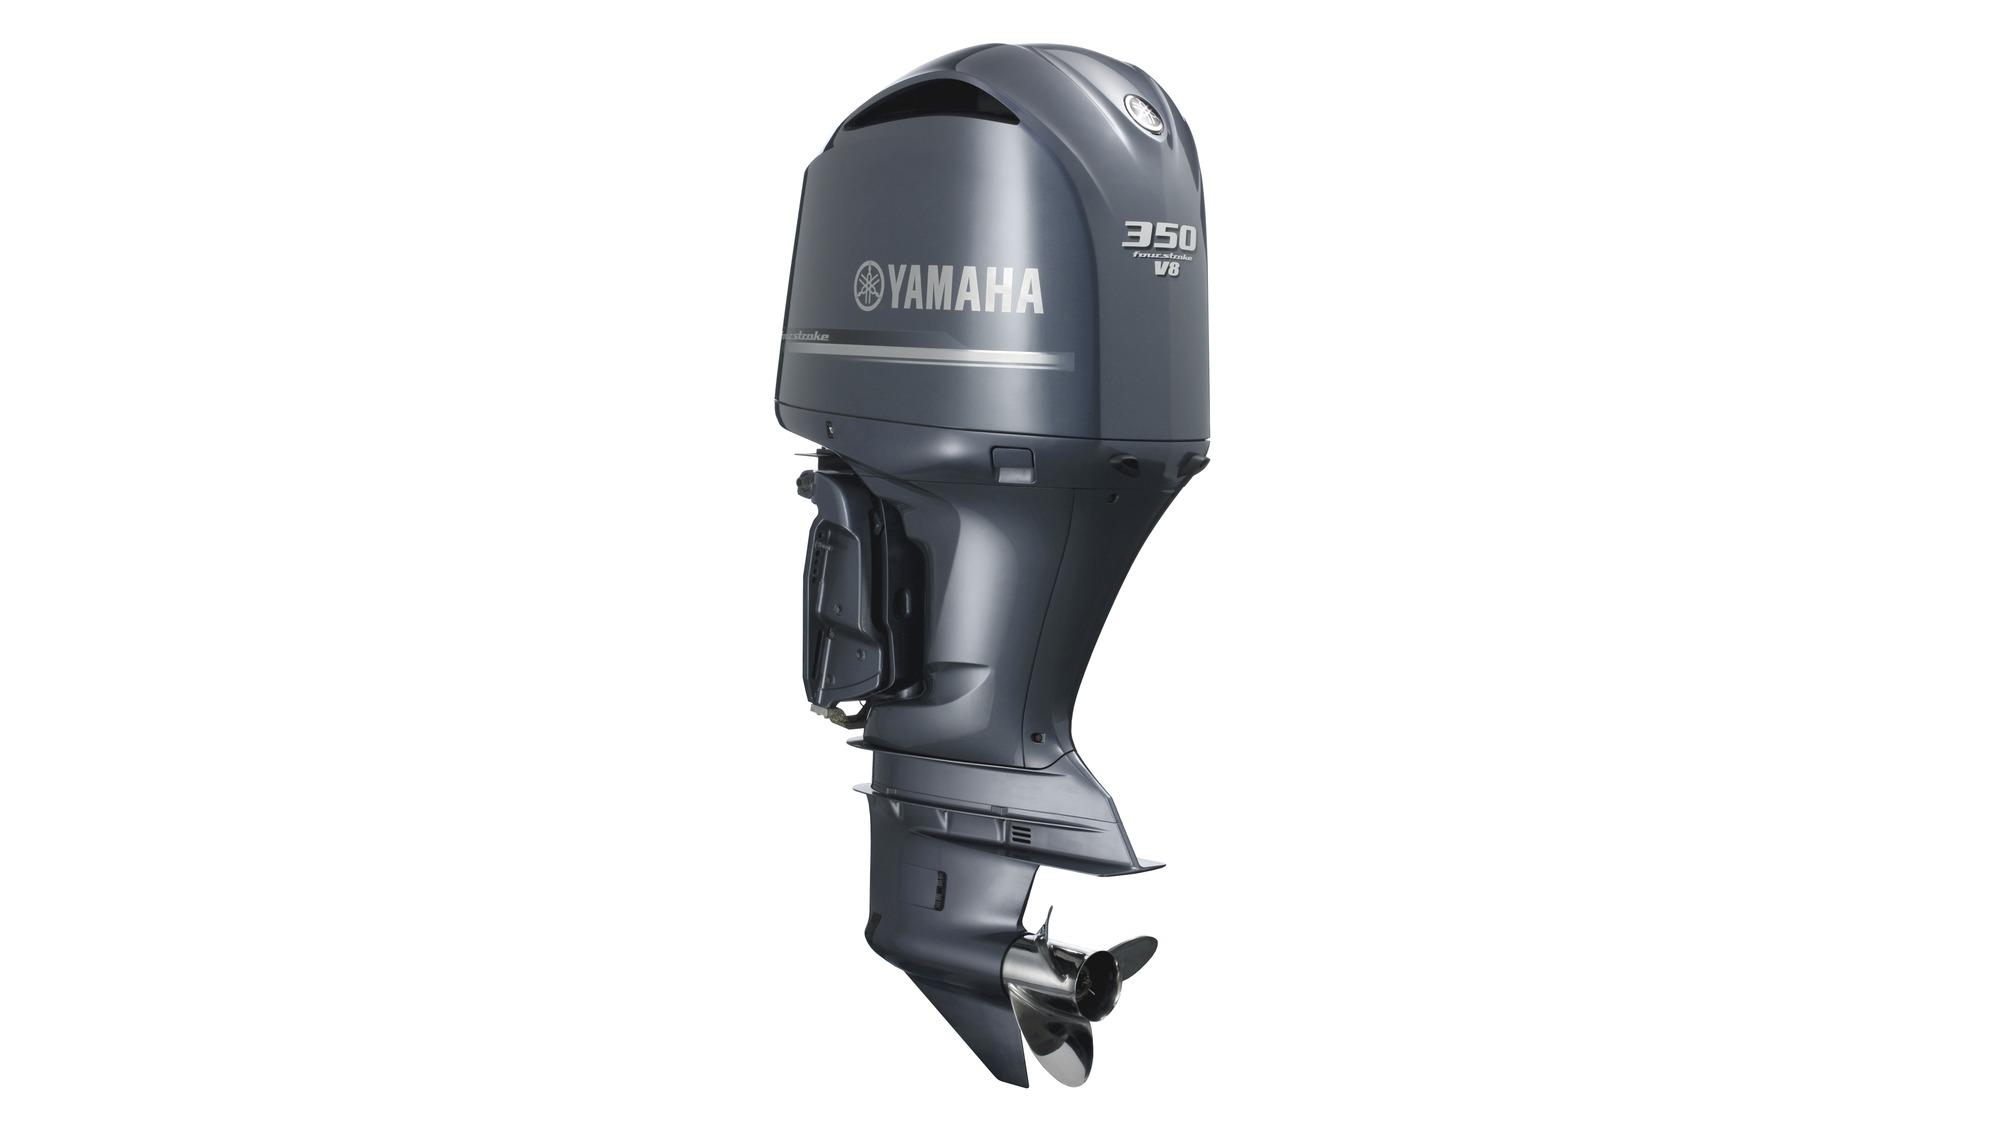 2014-Yamaha-F350-EU-NA-Studio-001.jpg